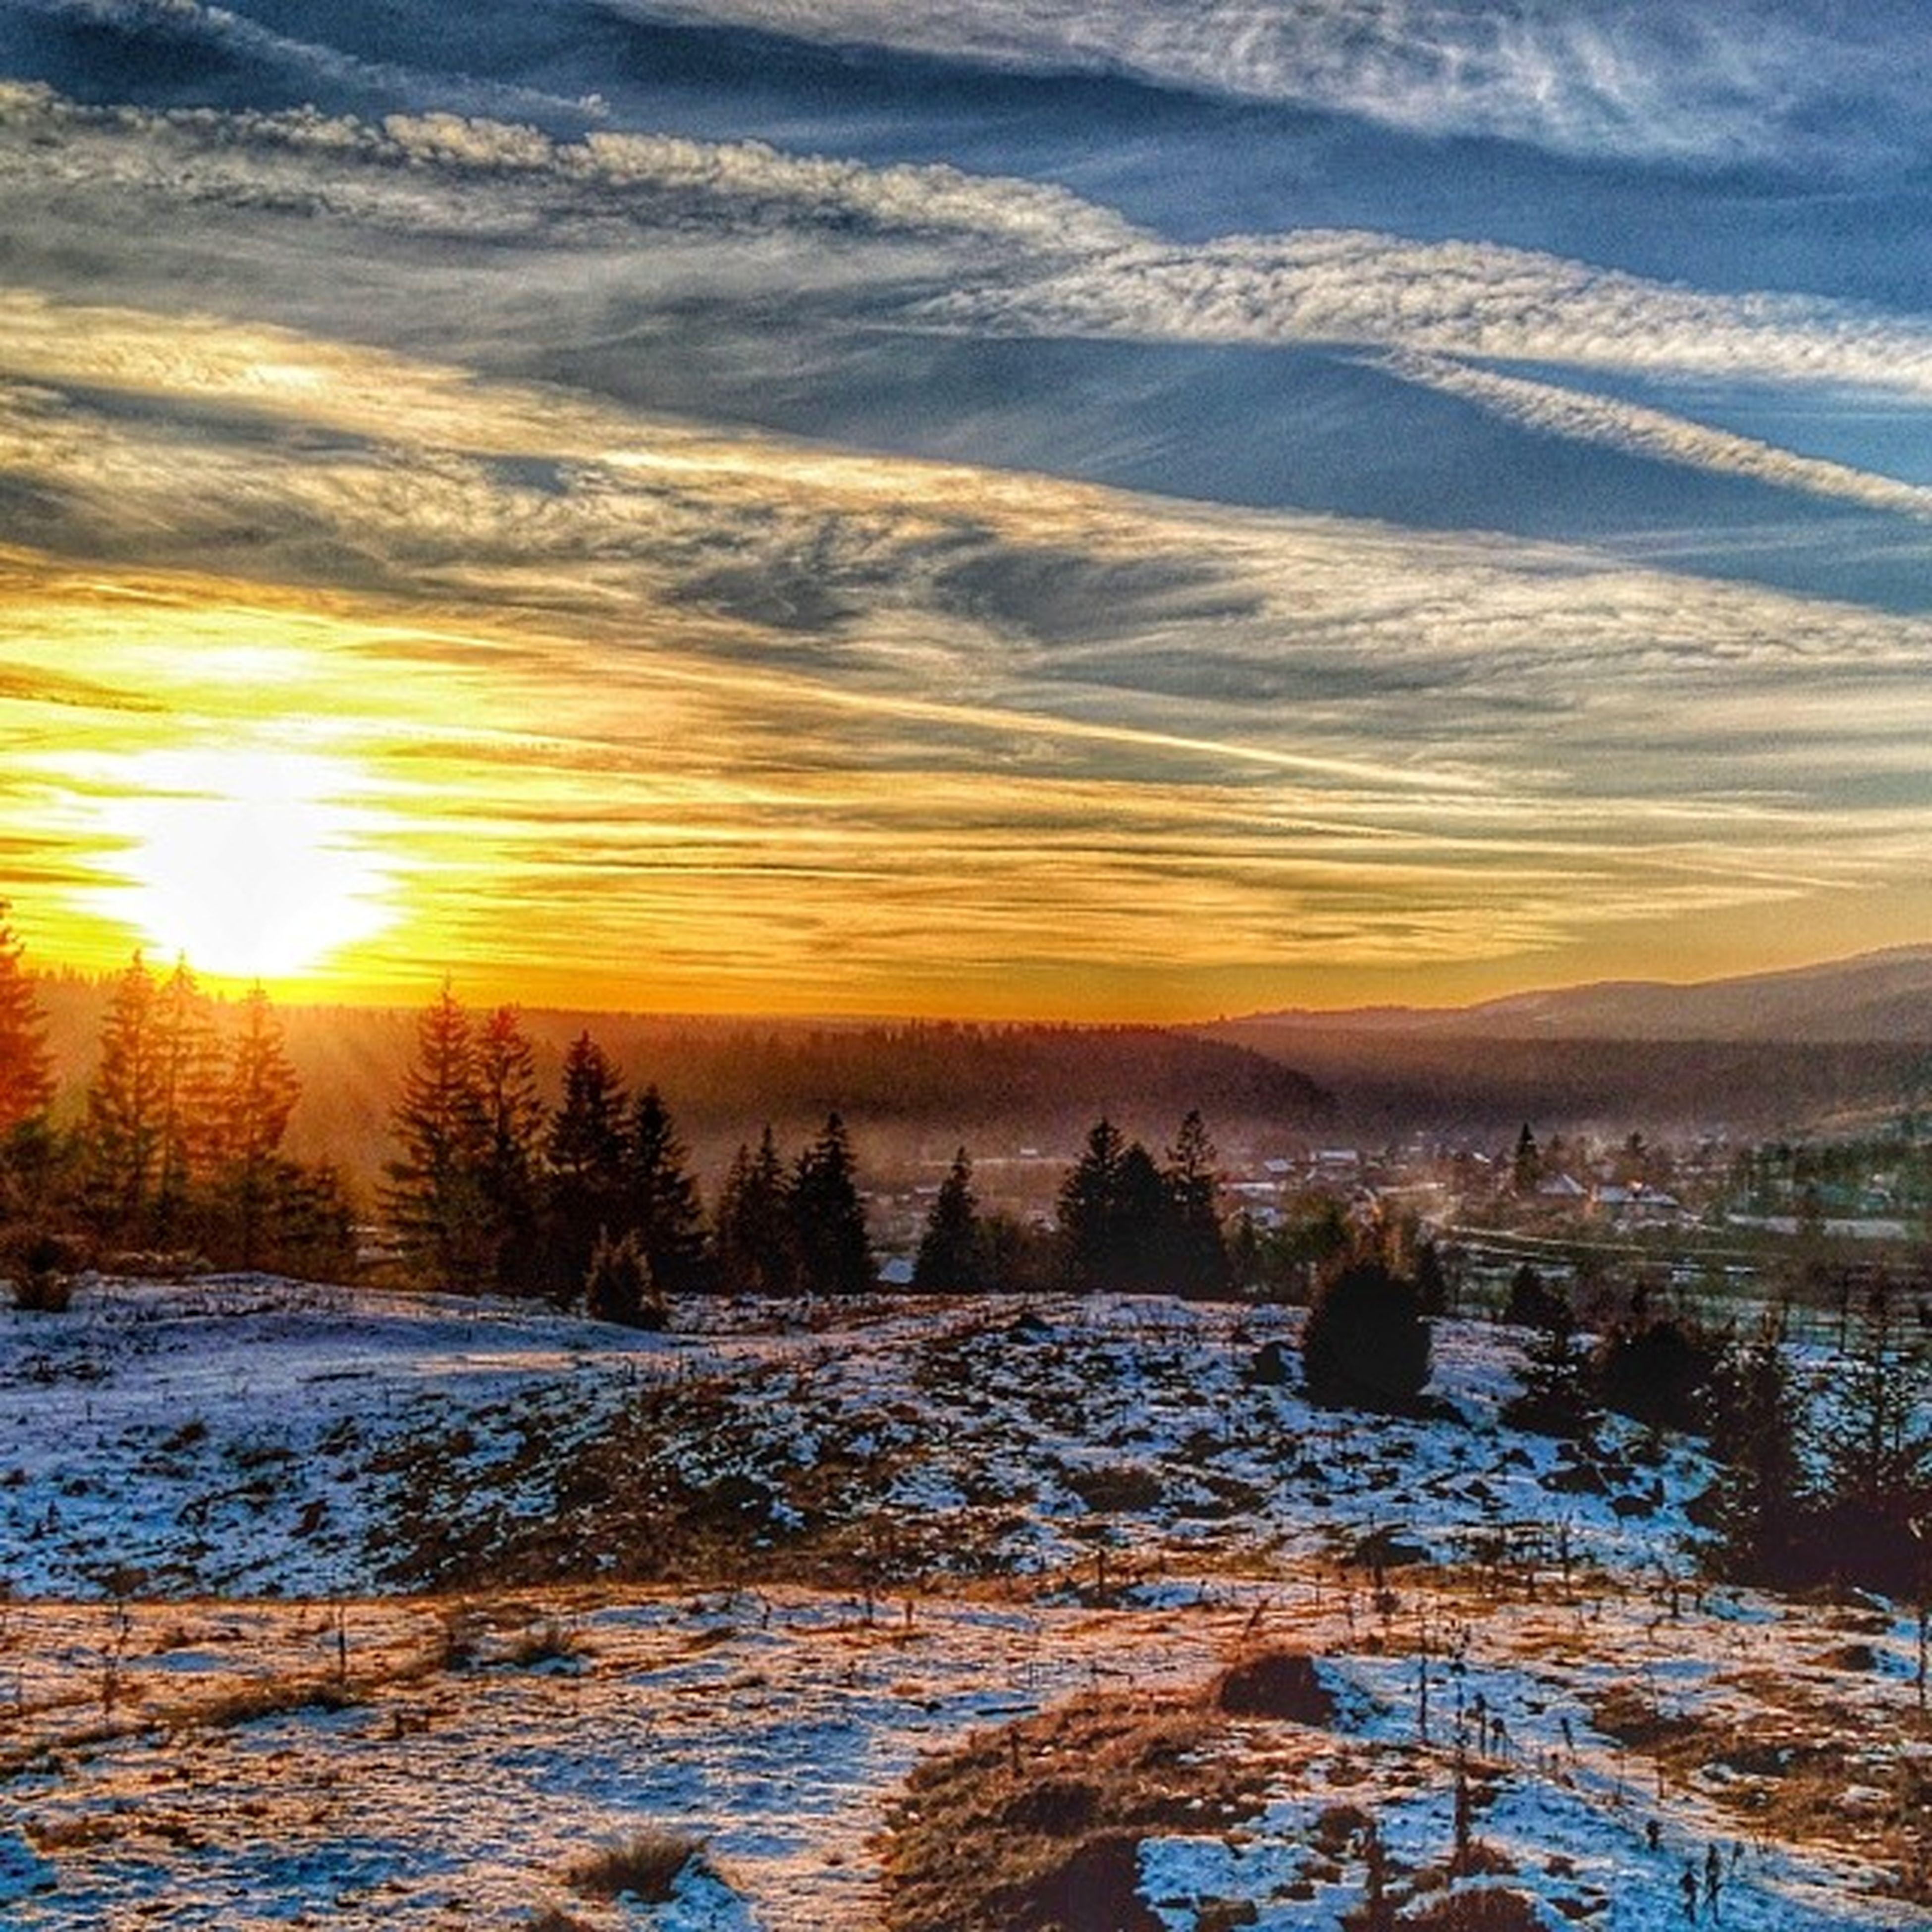 snow, winter, cold temperature, sunset, season, tranquil scene, tranquility, scenics, beauty in nature, sun, frozen, weather, orange color, nature, sky, landscape, covering, tree, sunlight, non-urban scene